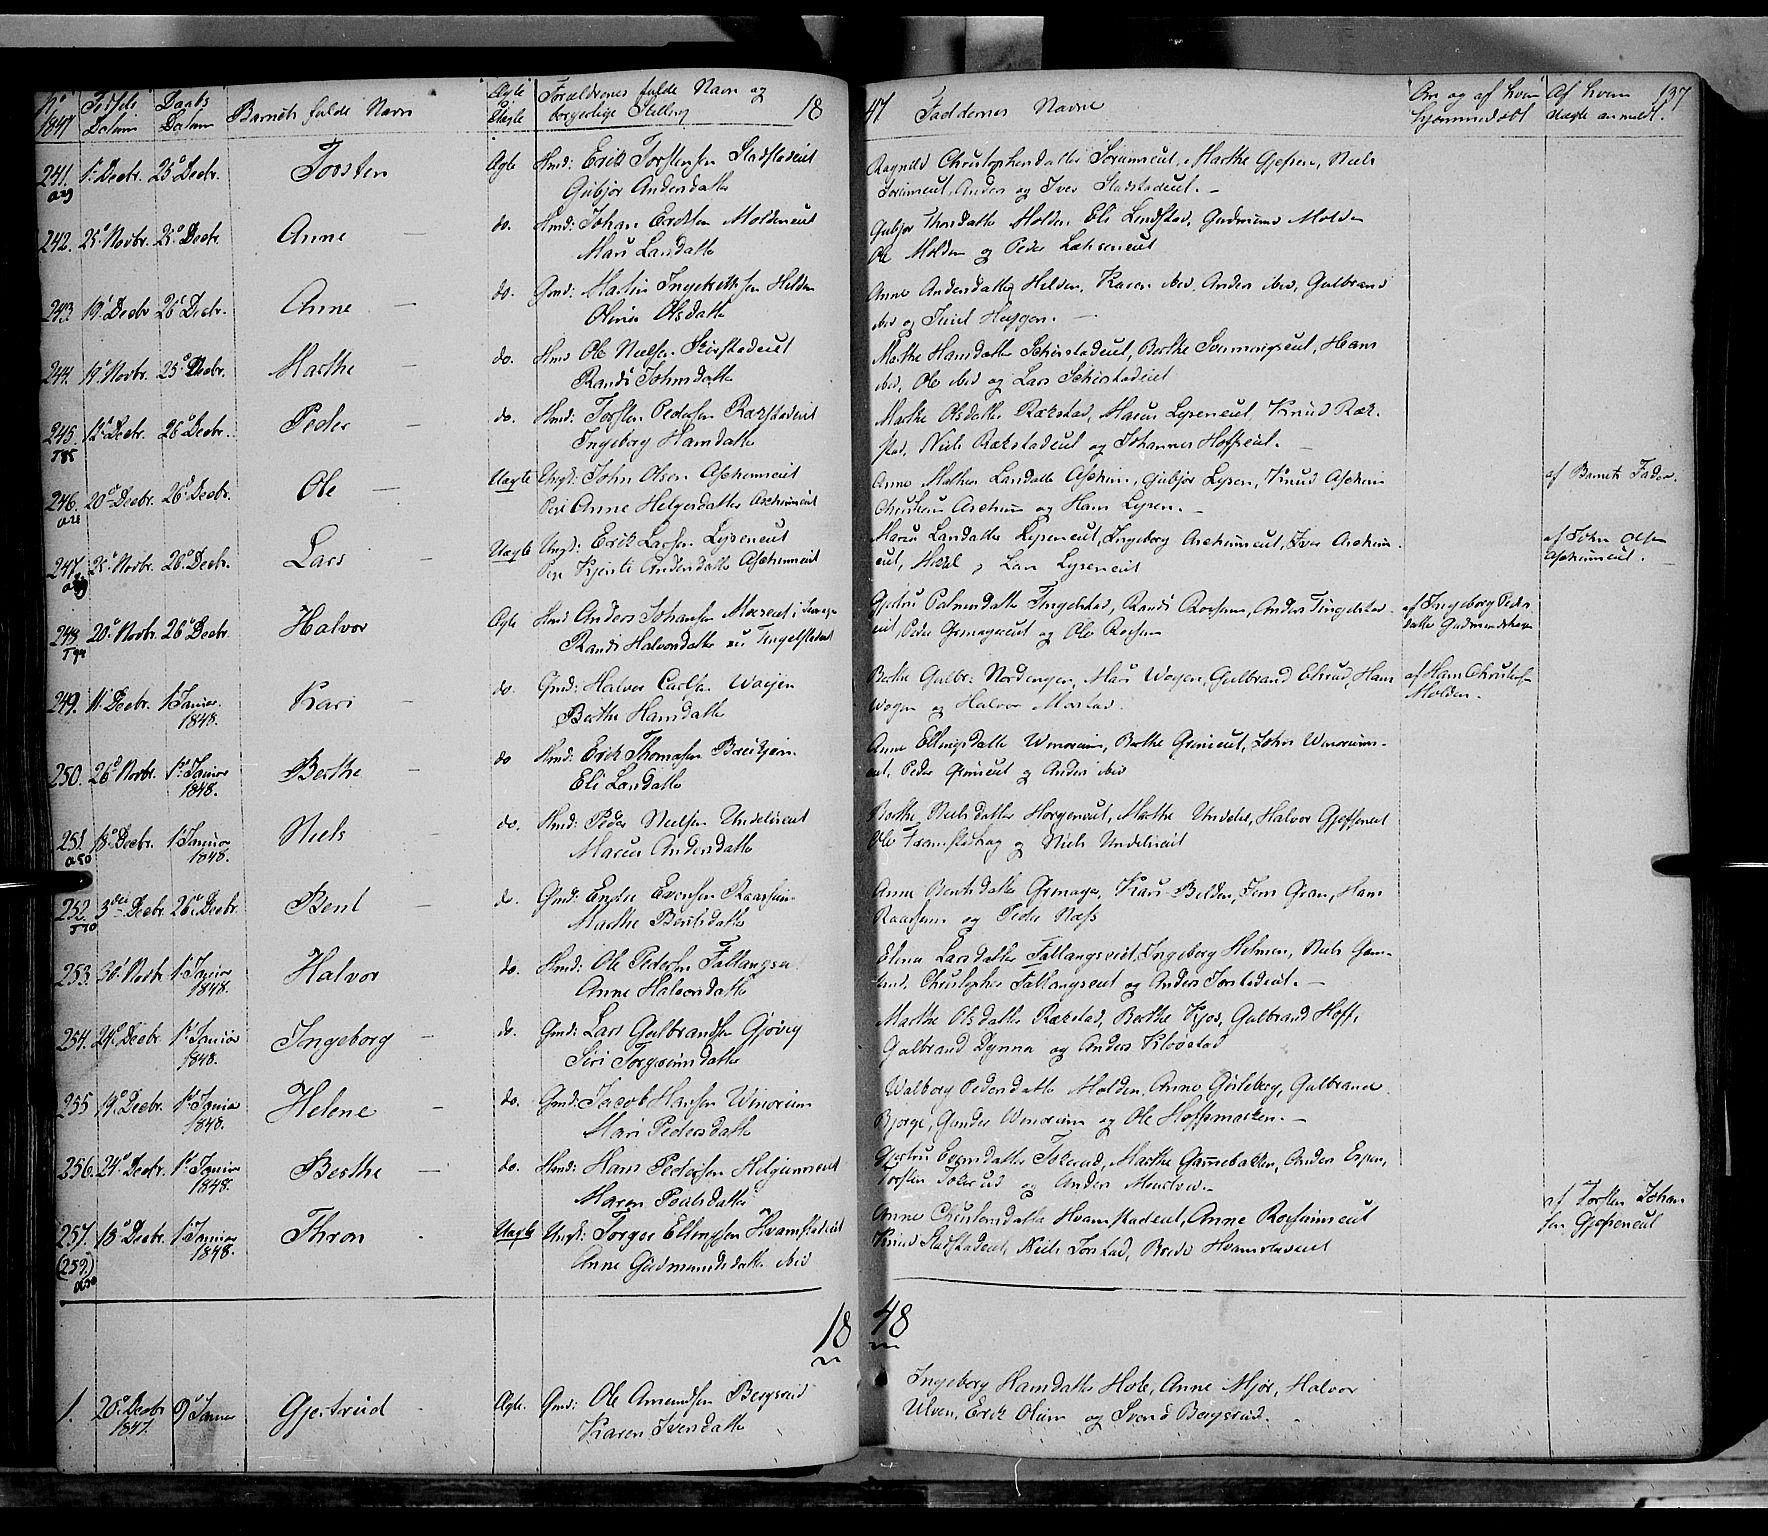 SAH, Gran prestekontor, Ministerialbok nr. 11, 1842-1856, s. 136-137